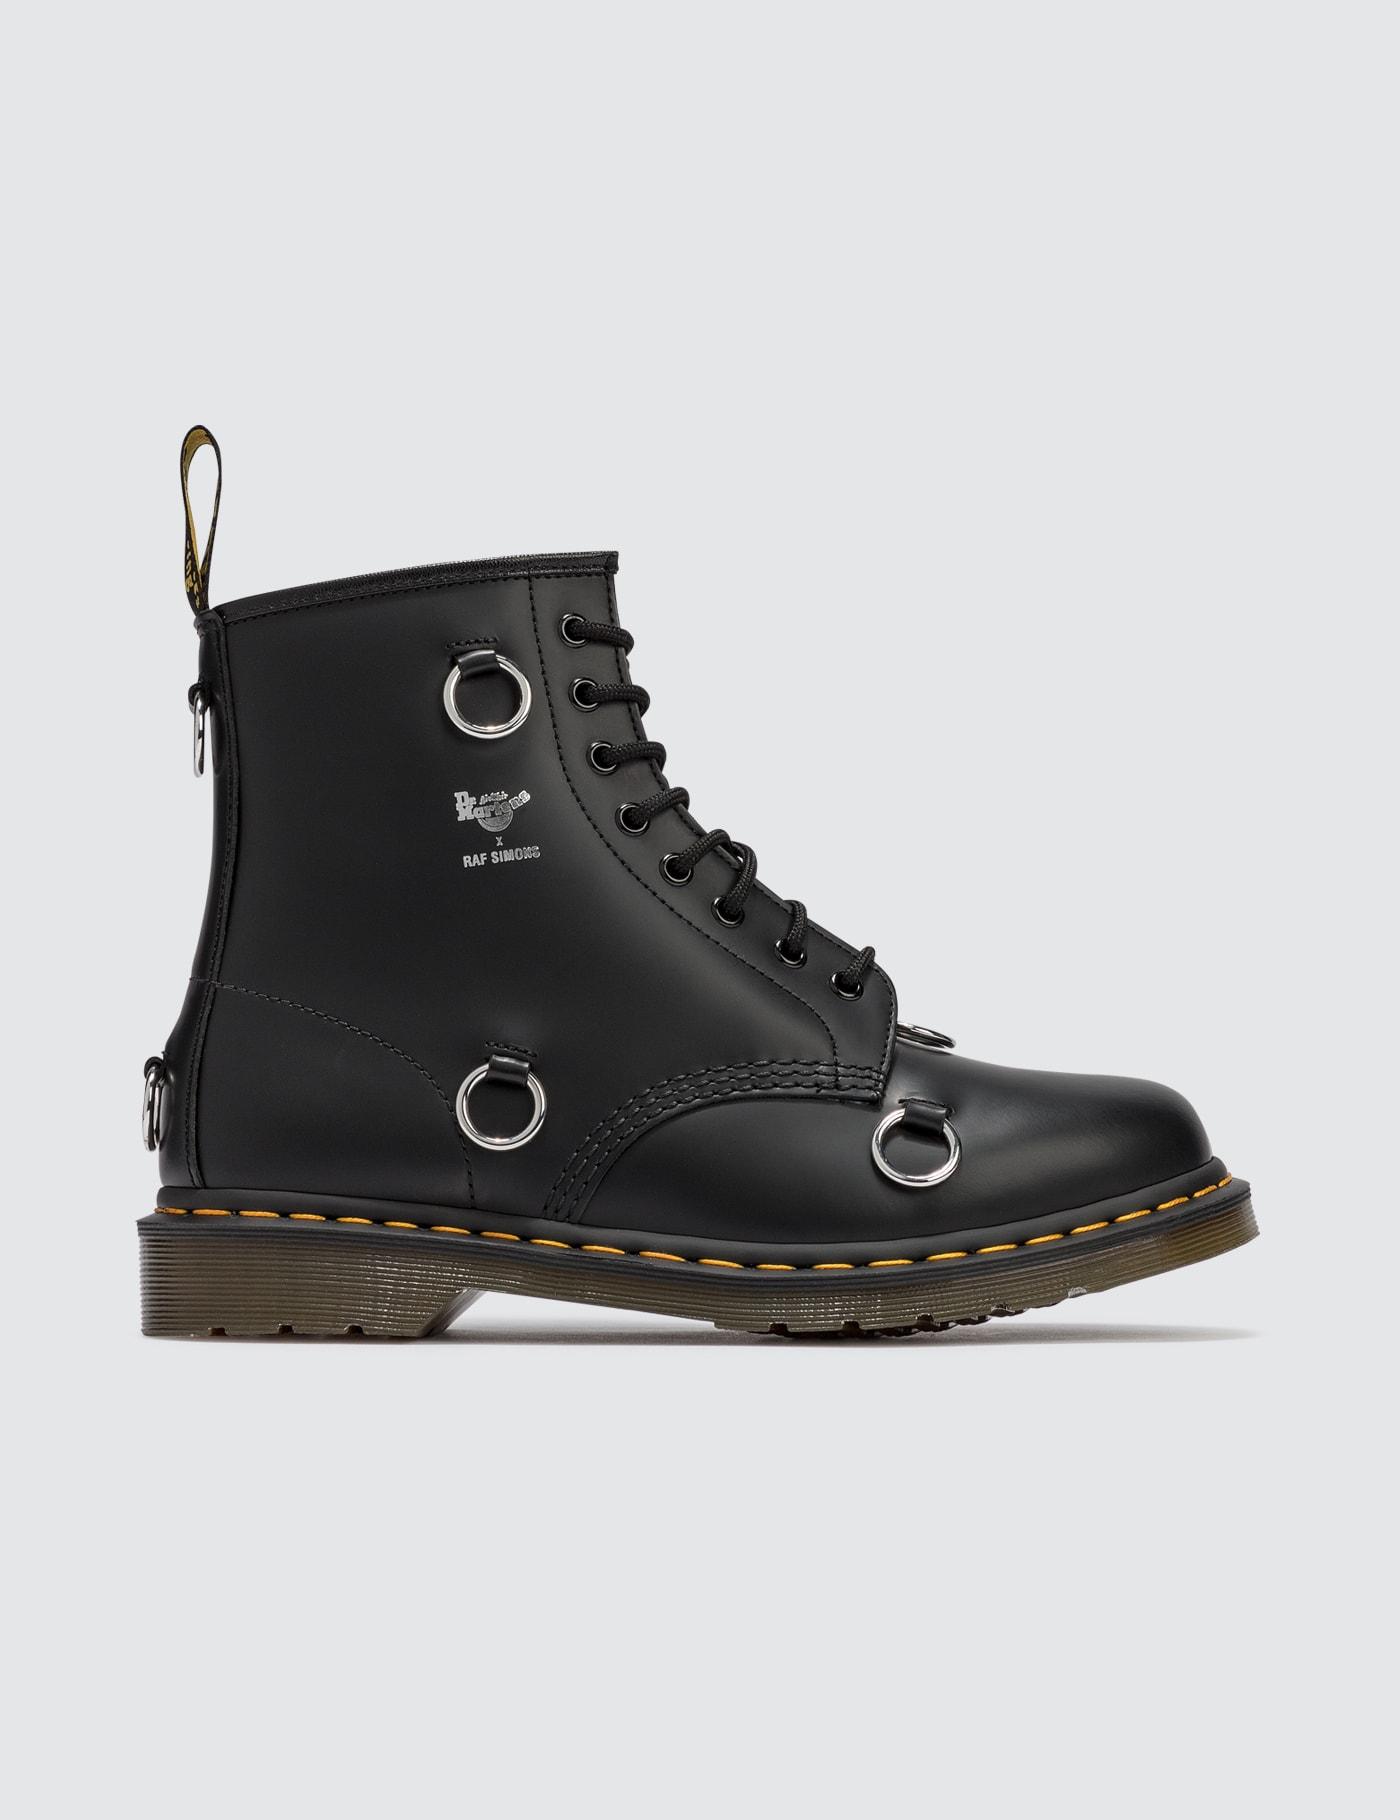 Dr. Martens X Raf Simons 1460 Boots